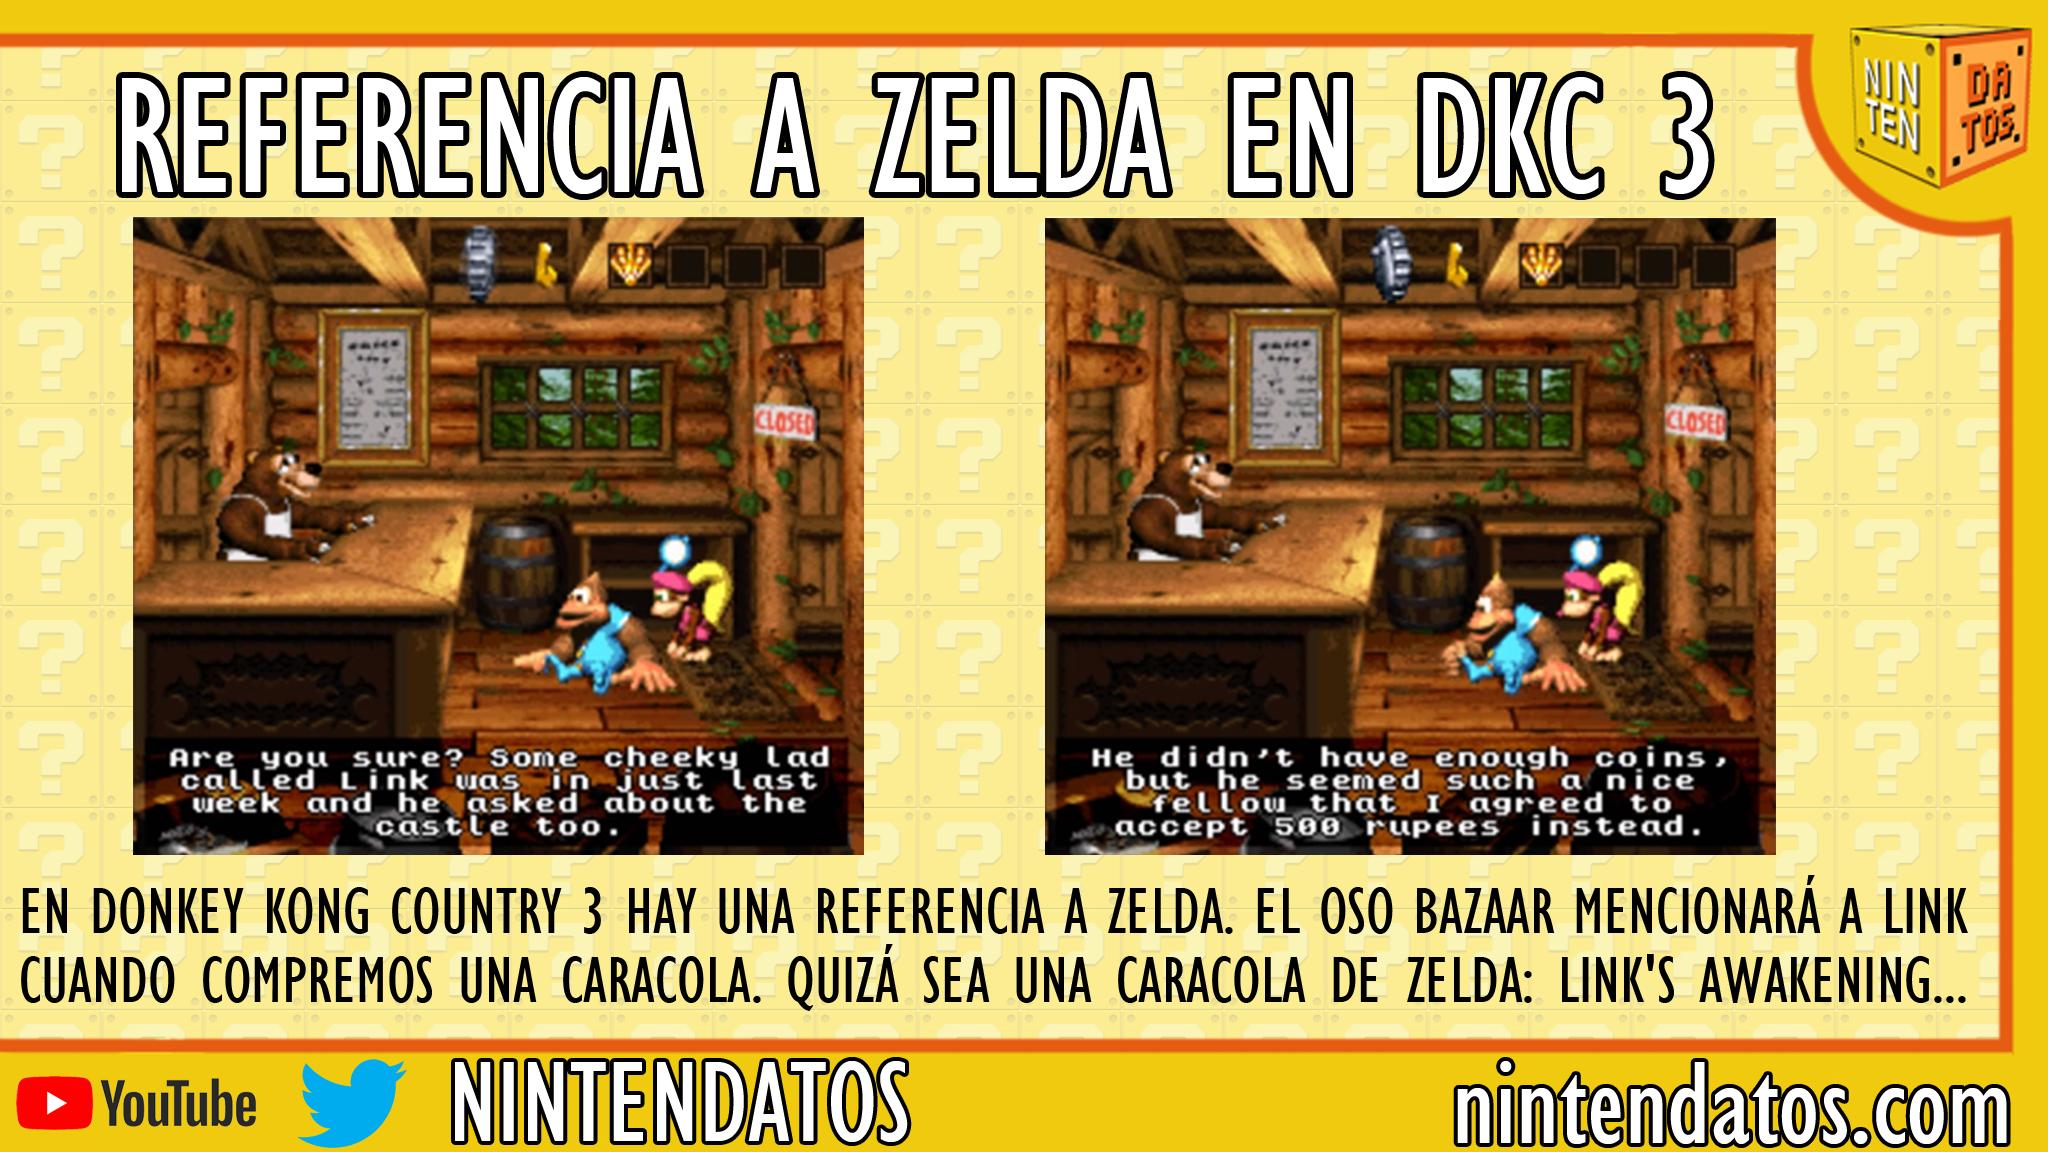 Referencia a Zelda en Donkey Kong Country 3